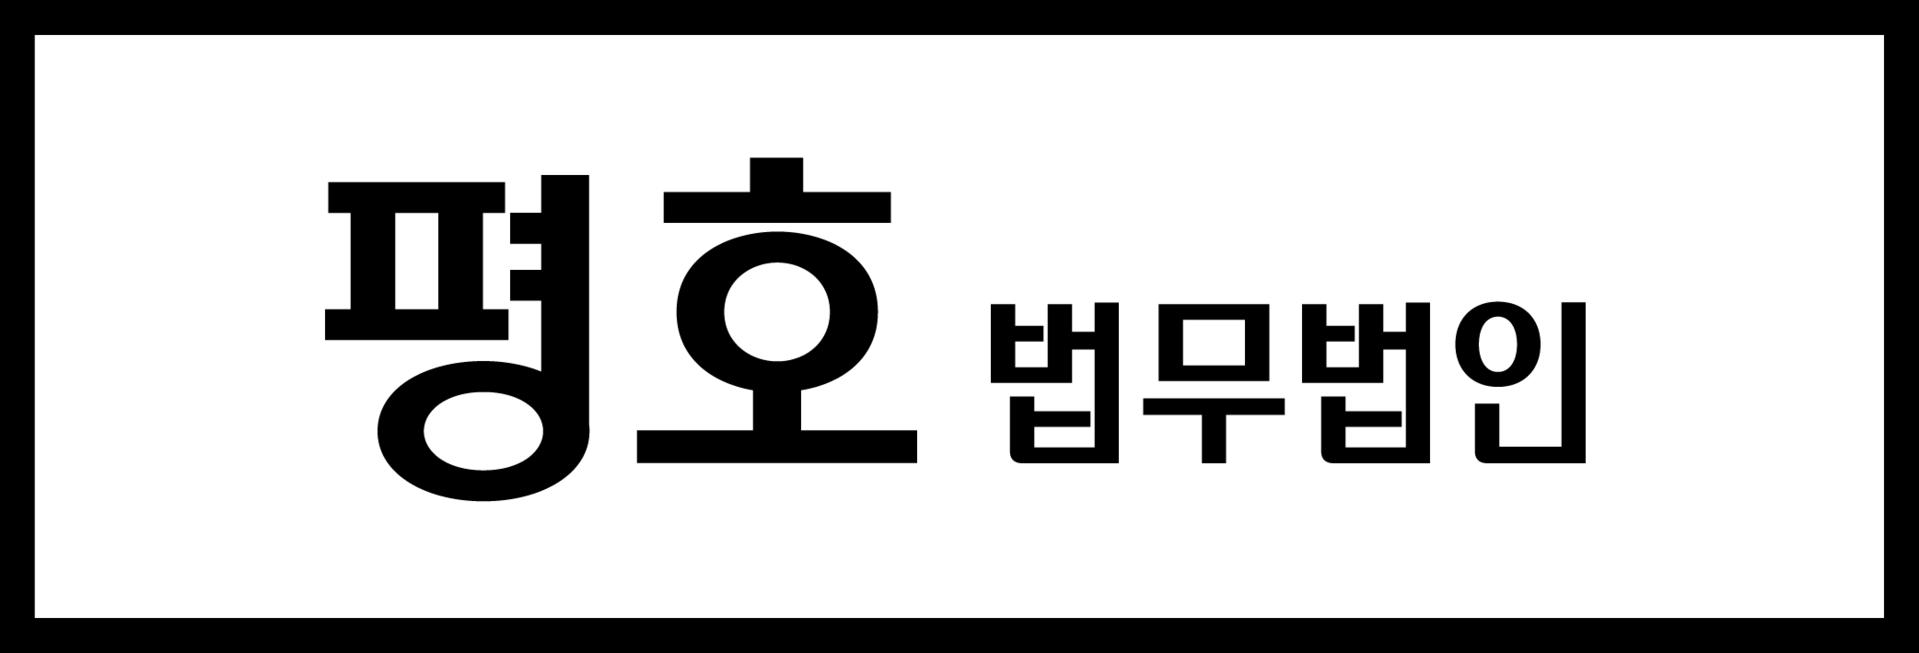 02-599-5156